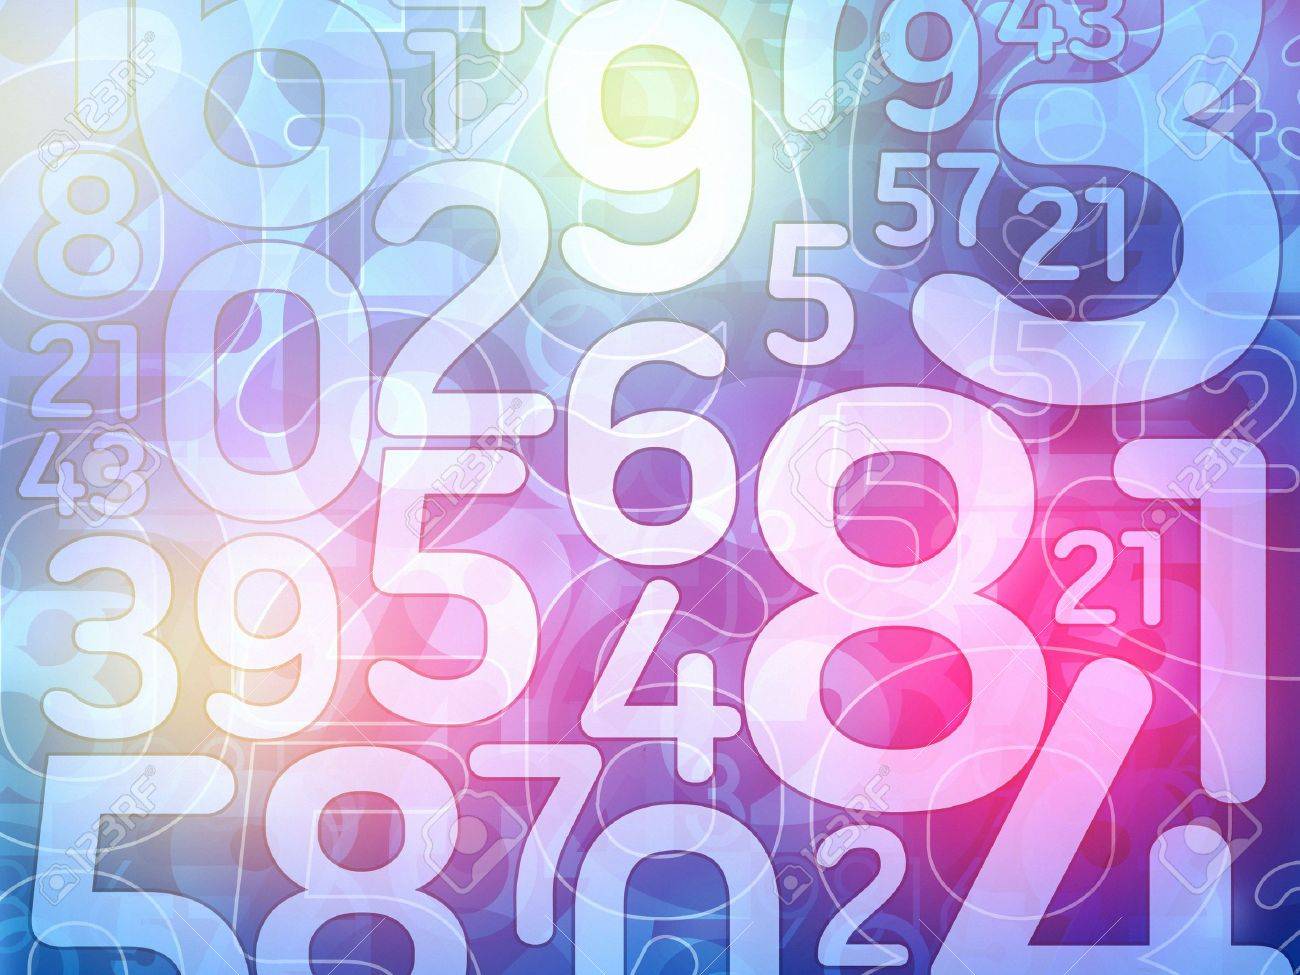 colorful random number math background illustration Stock Illustration - 28080238